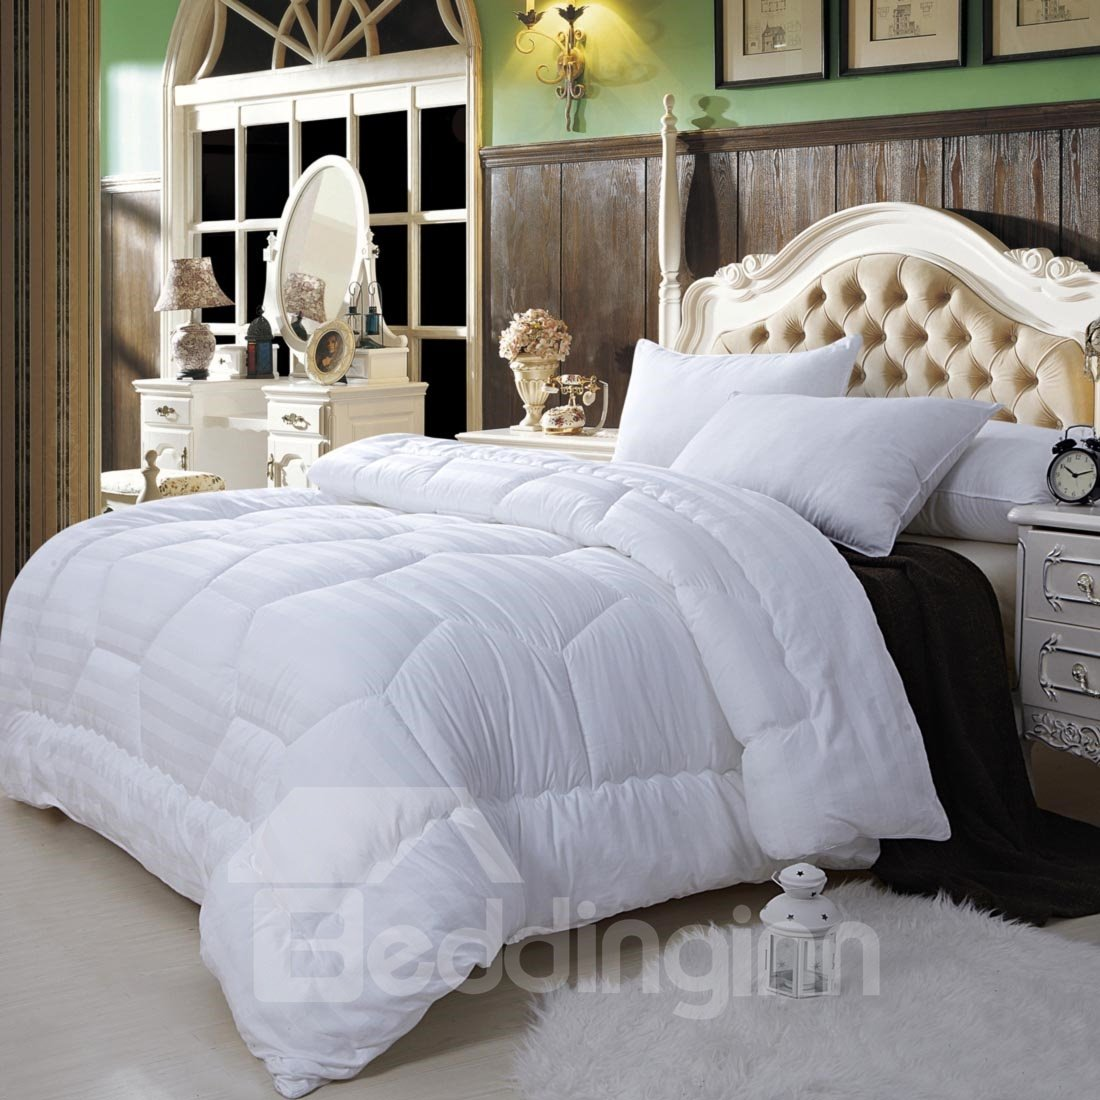 Super Soft White Twin 100% Cotton Down Filled Comforter